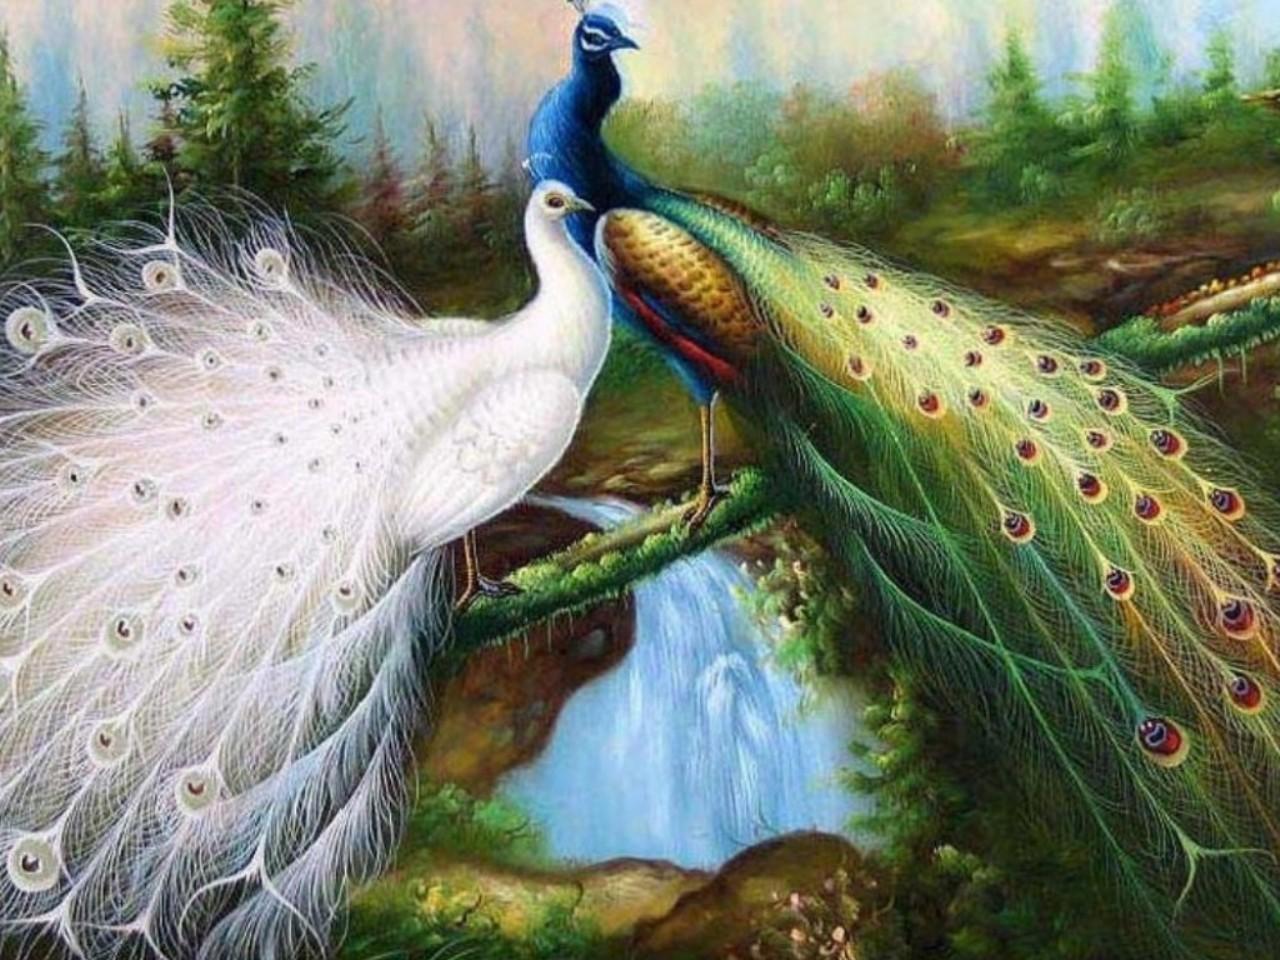 Peacock HD Wallpaper 1280x960